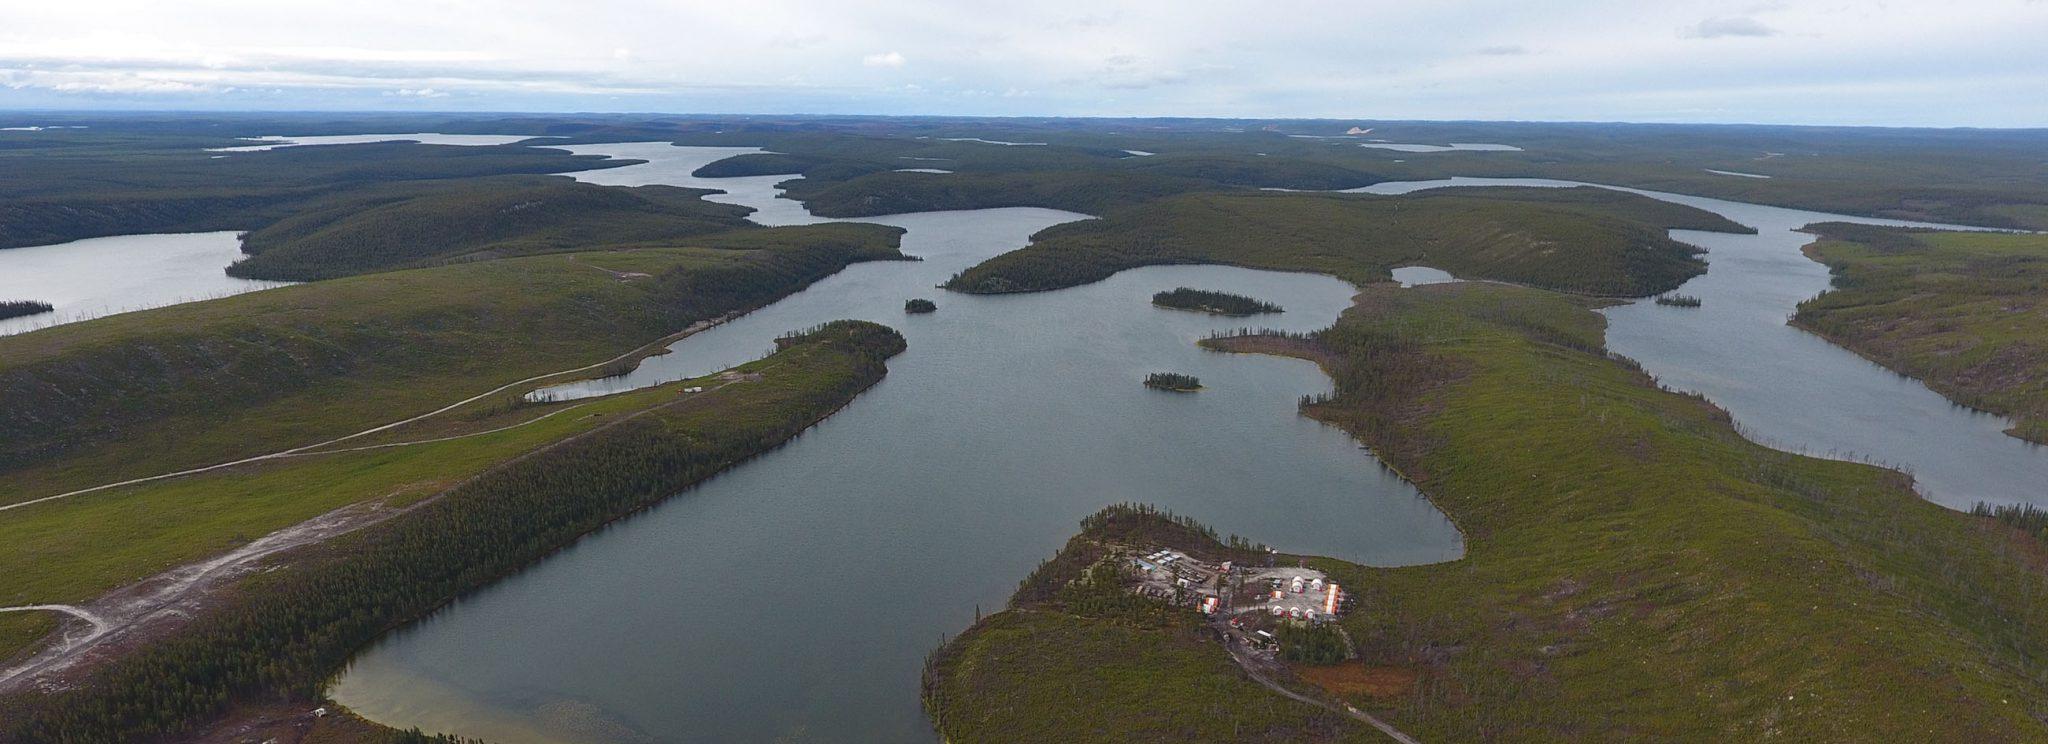 Shareholders of Overseas Uranium Resources Development Co., Ltd. approve UEX acquisition of JCU (Canada) Exploration Company